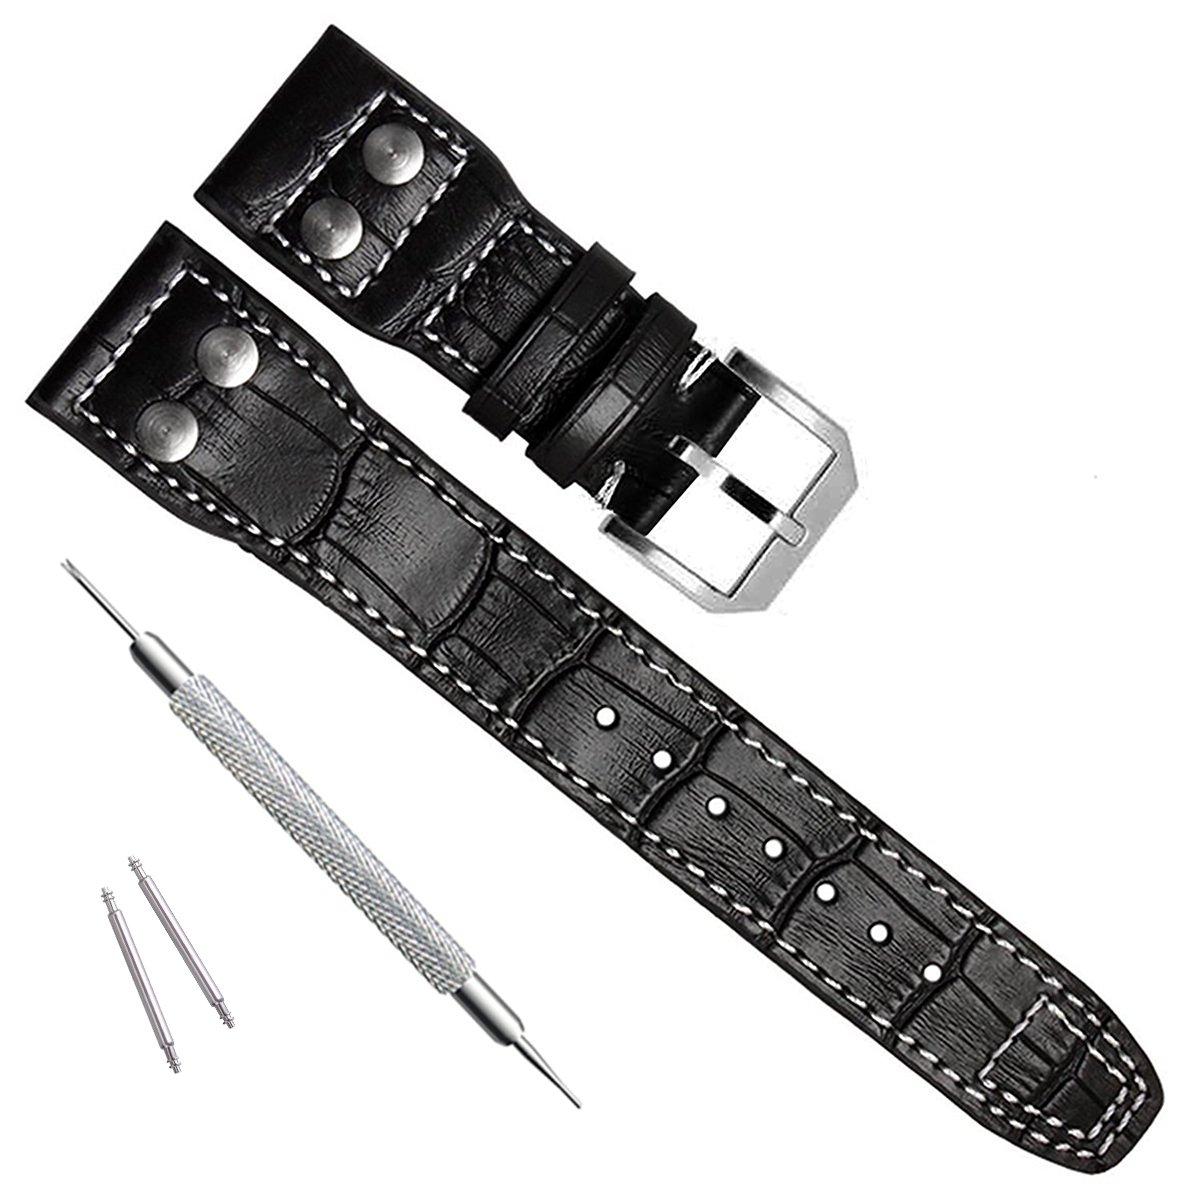 22 mm本革時計ストラップバンドフィットfor IWCパイロットのWatchs LE Black/Buckle Black/Buckle B01GKP8QQI